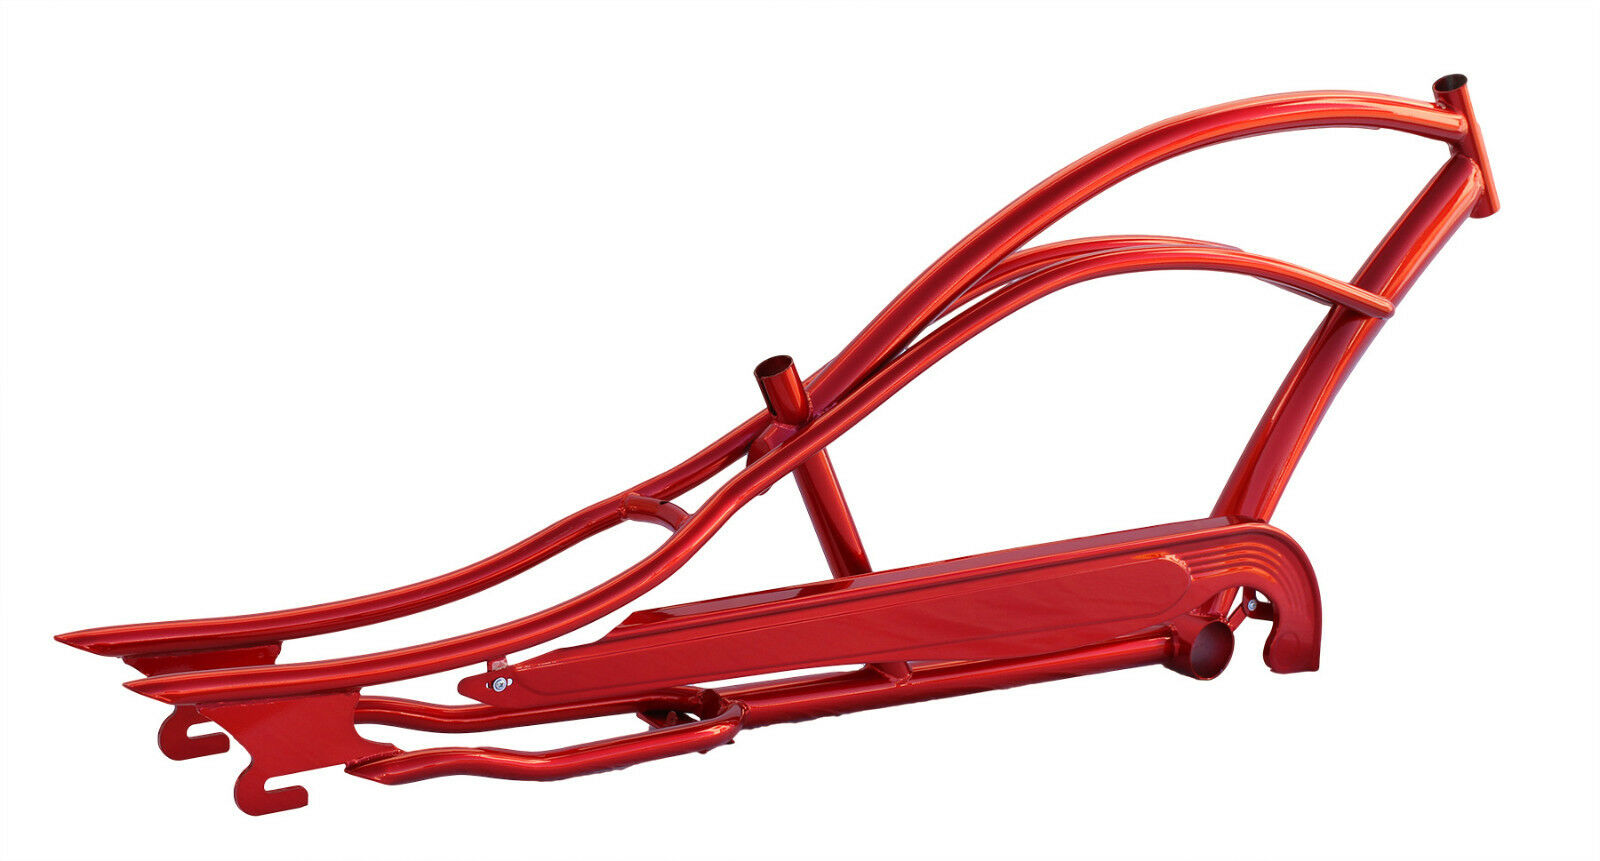 New 26  Stretch Beach Cruiser Bike Bicycle Micargi Mustang Frame Red